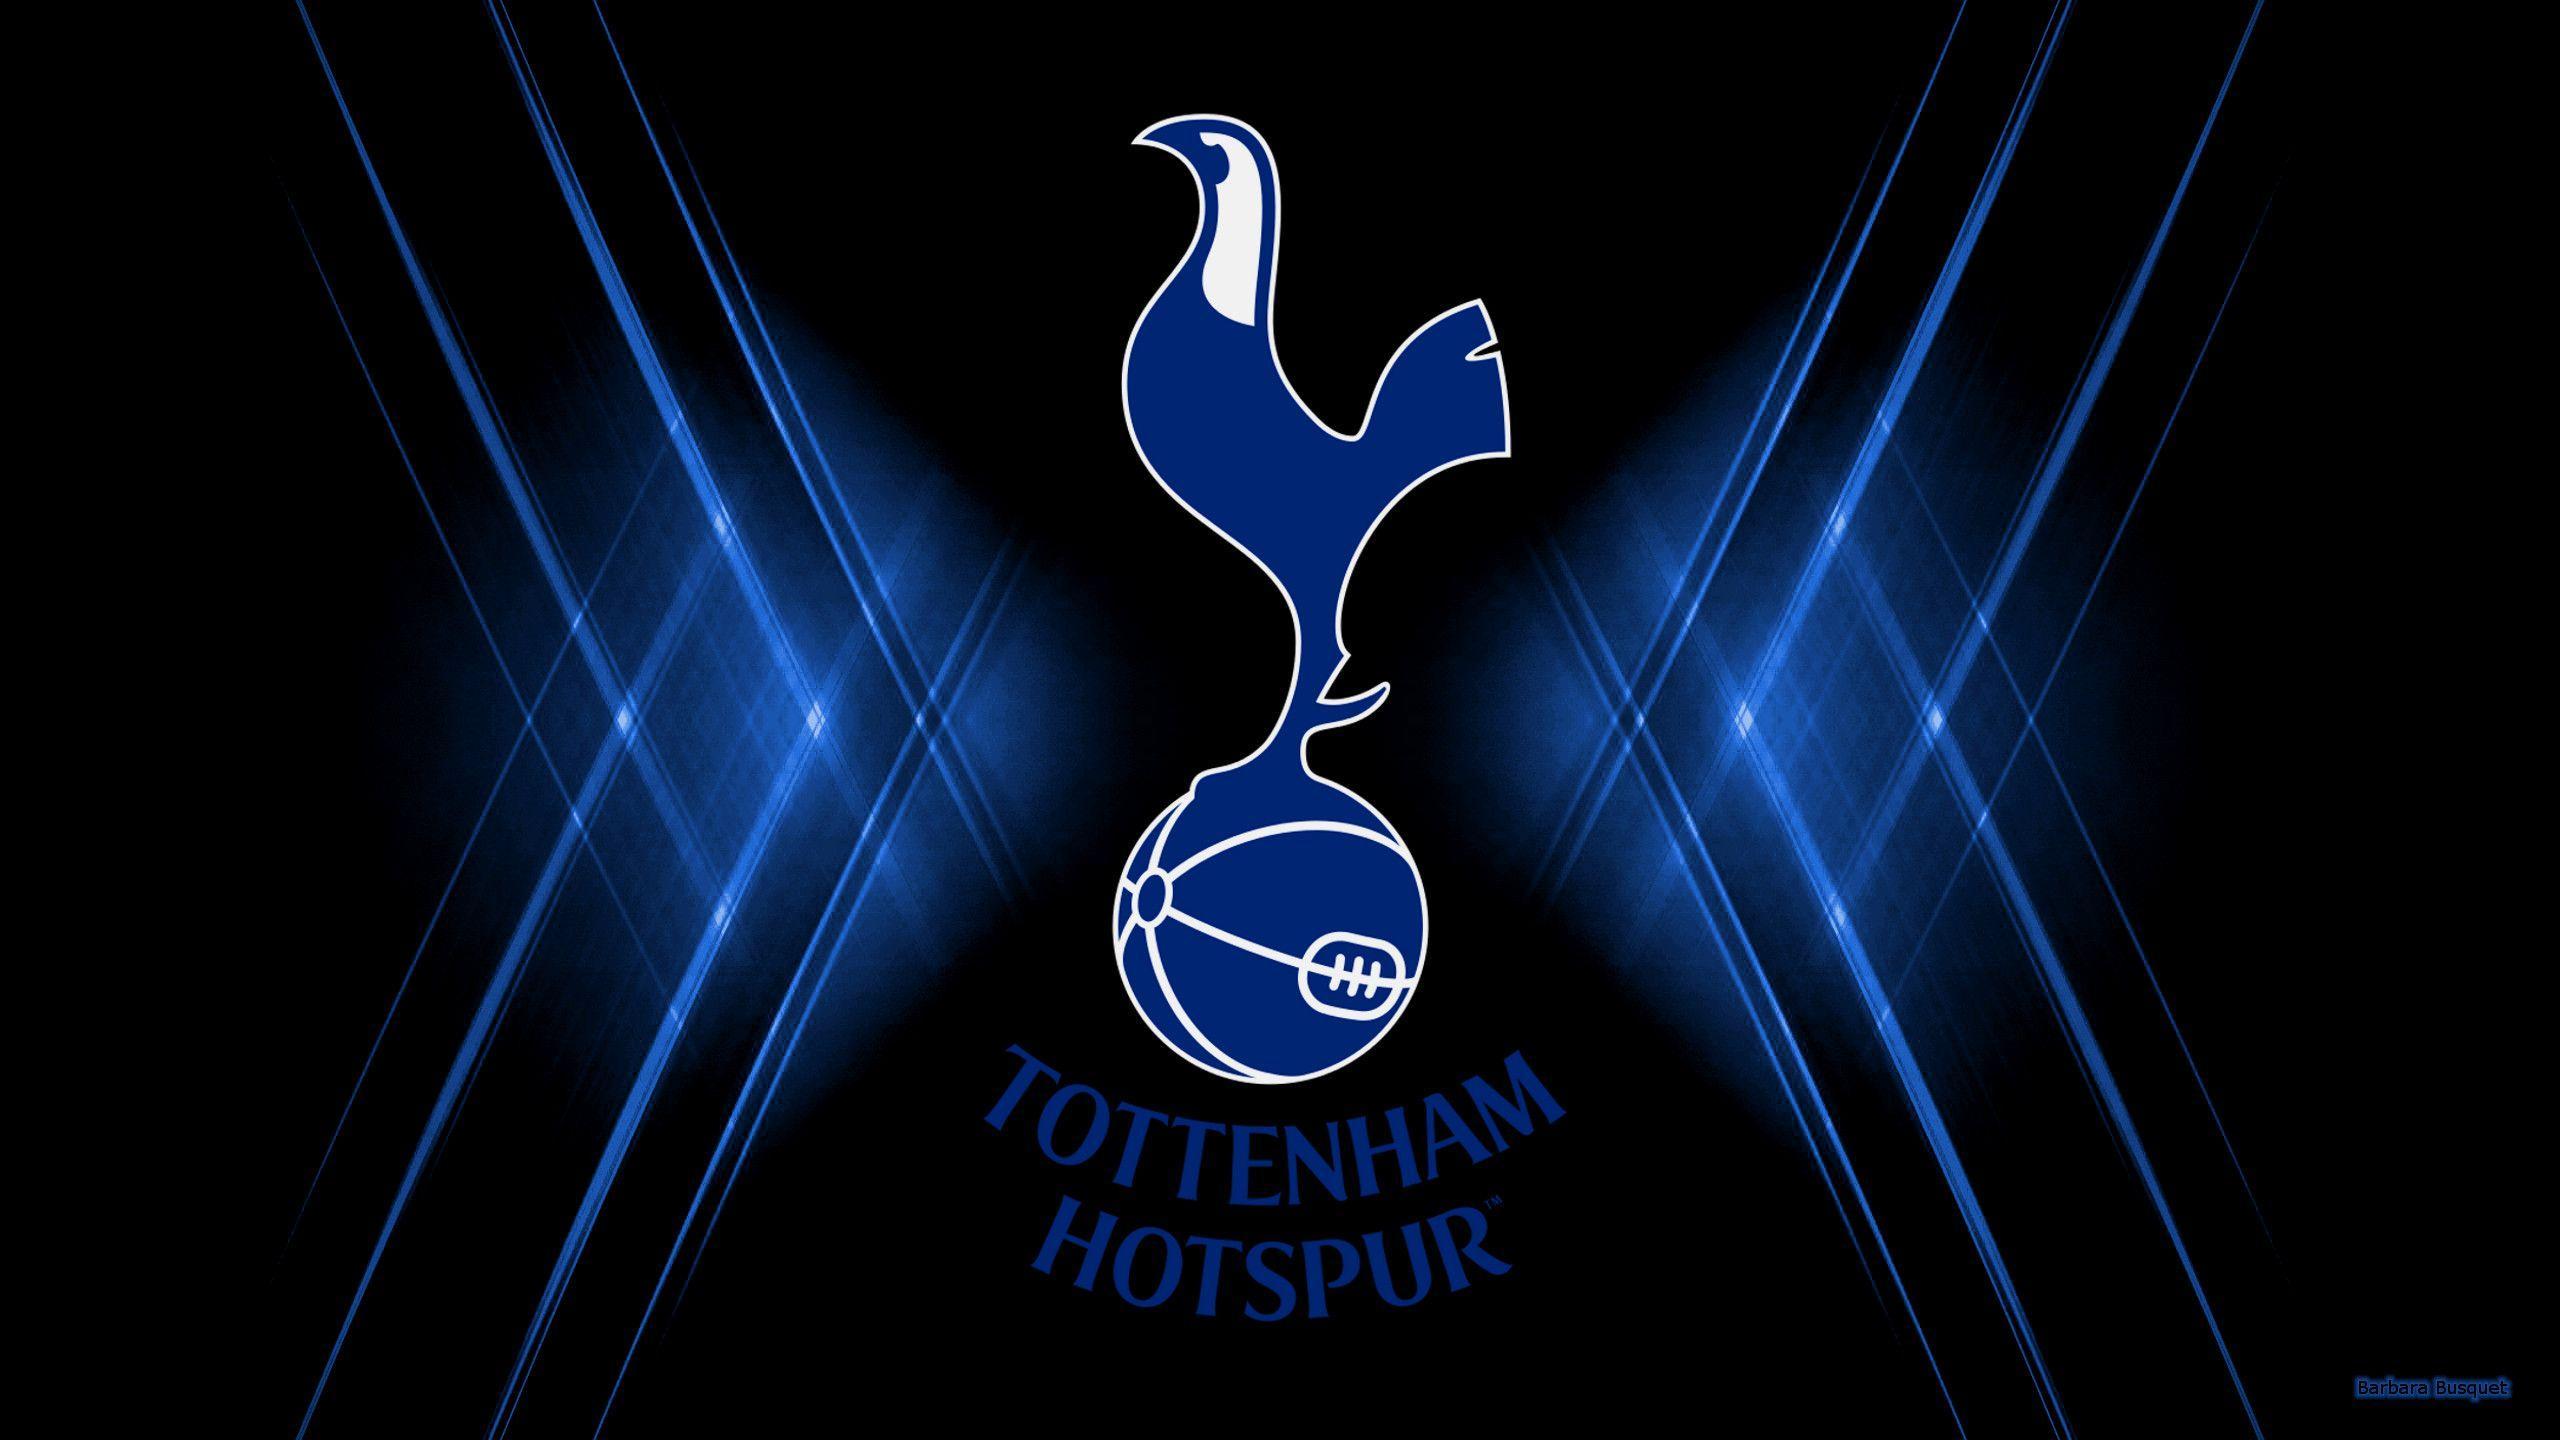 Tottenham Hotspur F.C. Teams Background 5